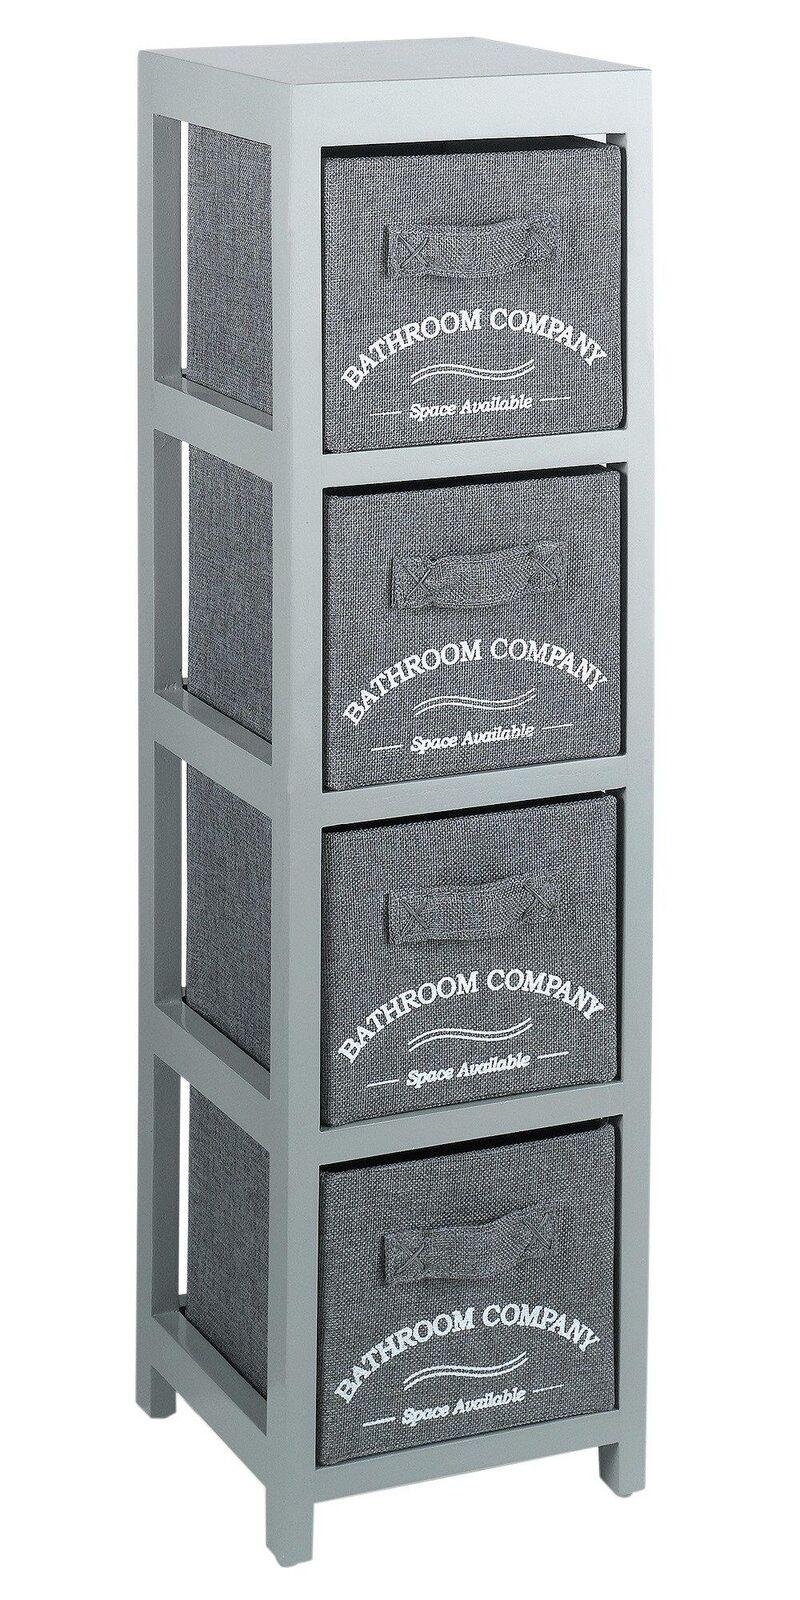 Grey Wooden 4 Drawer Canvas Baskets Bathroom Storage Unit Organiser Home Decor